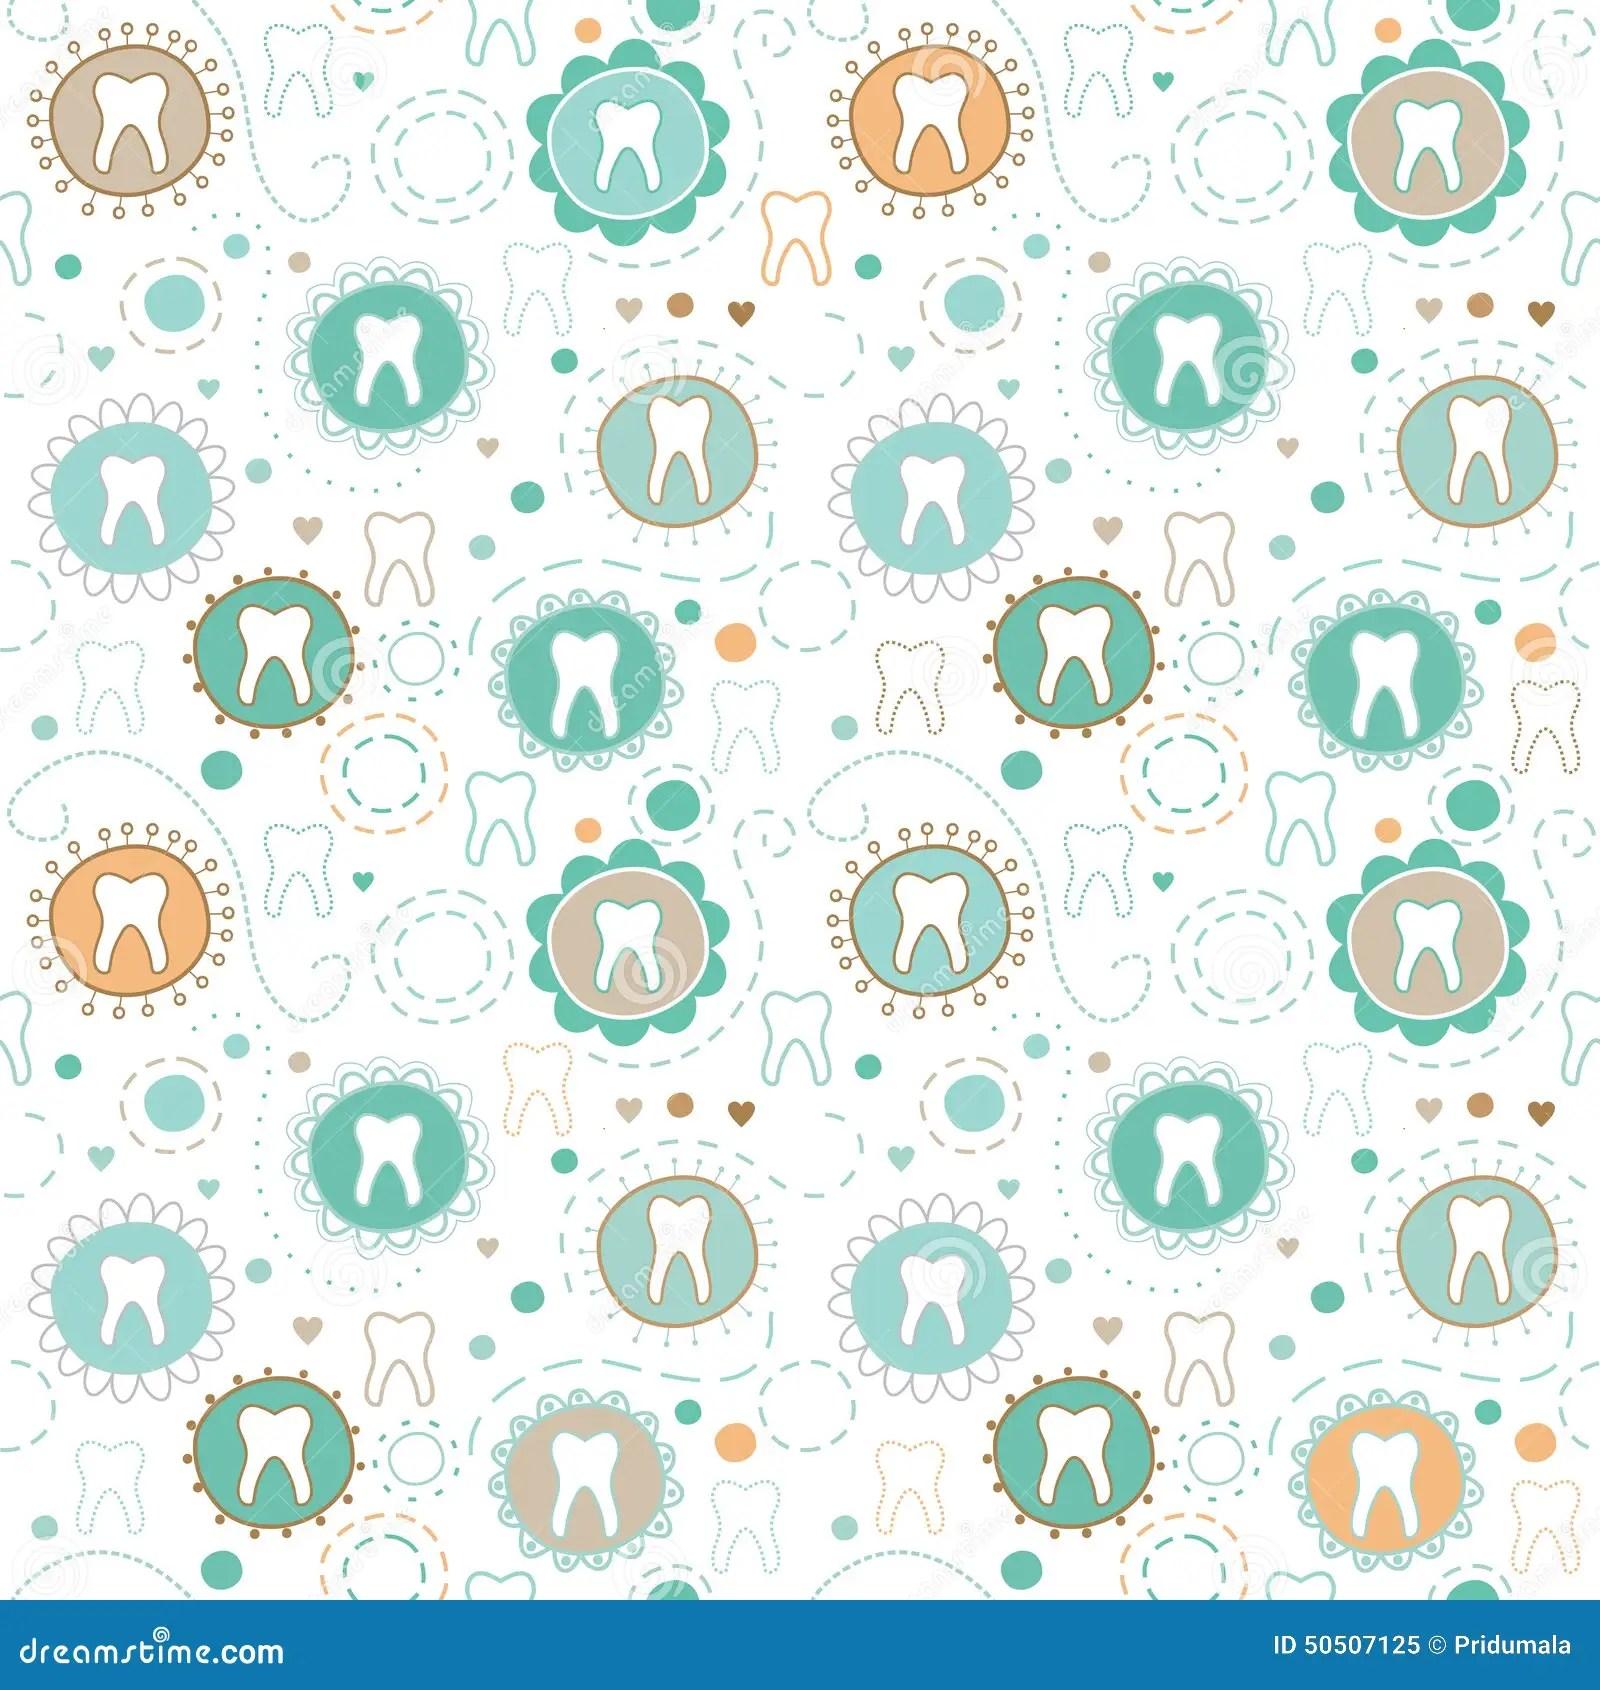 Cute Dental Wallpaper Seamless Texture With Cartoon Teeth Stock Vector